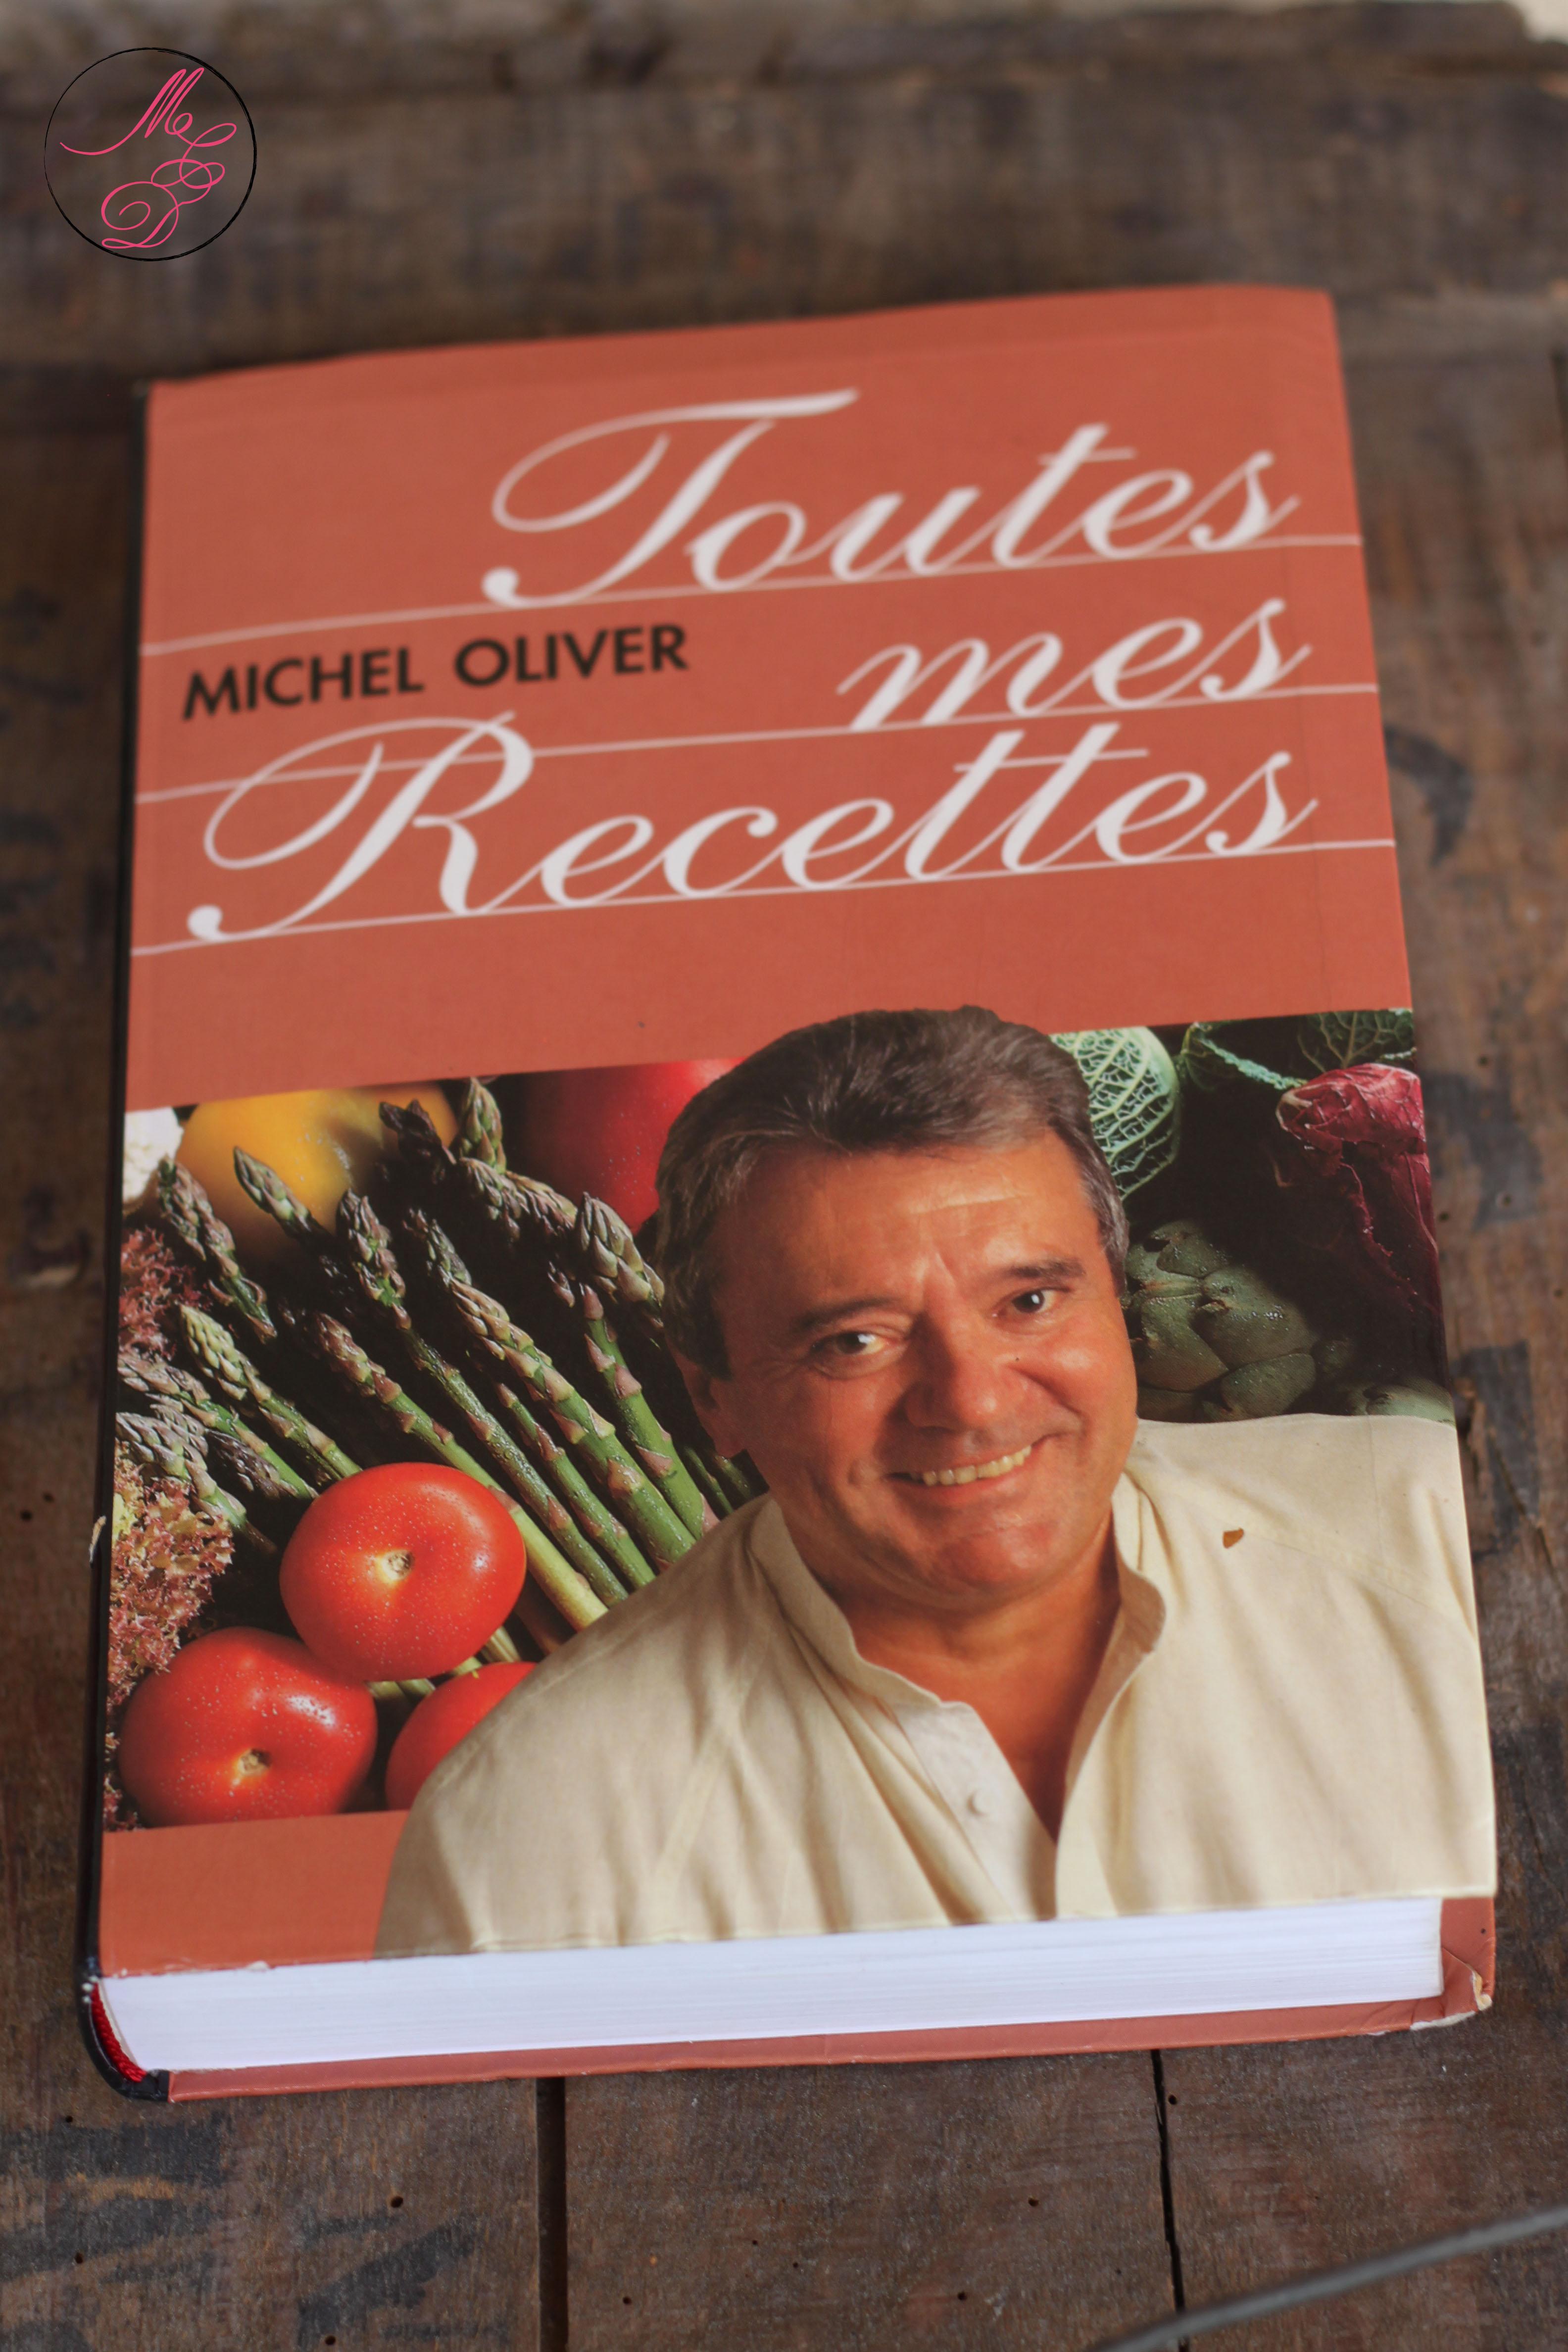 Gateau au chocolat michel oliver